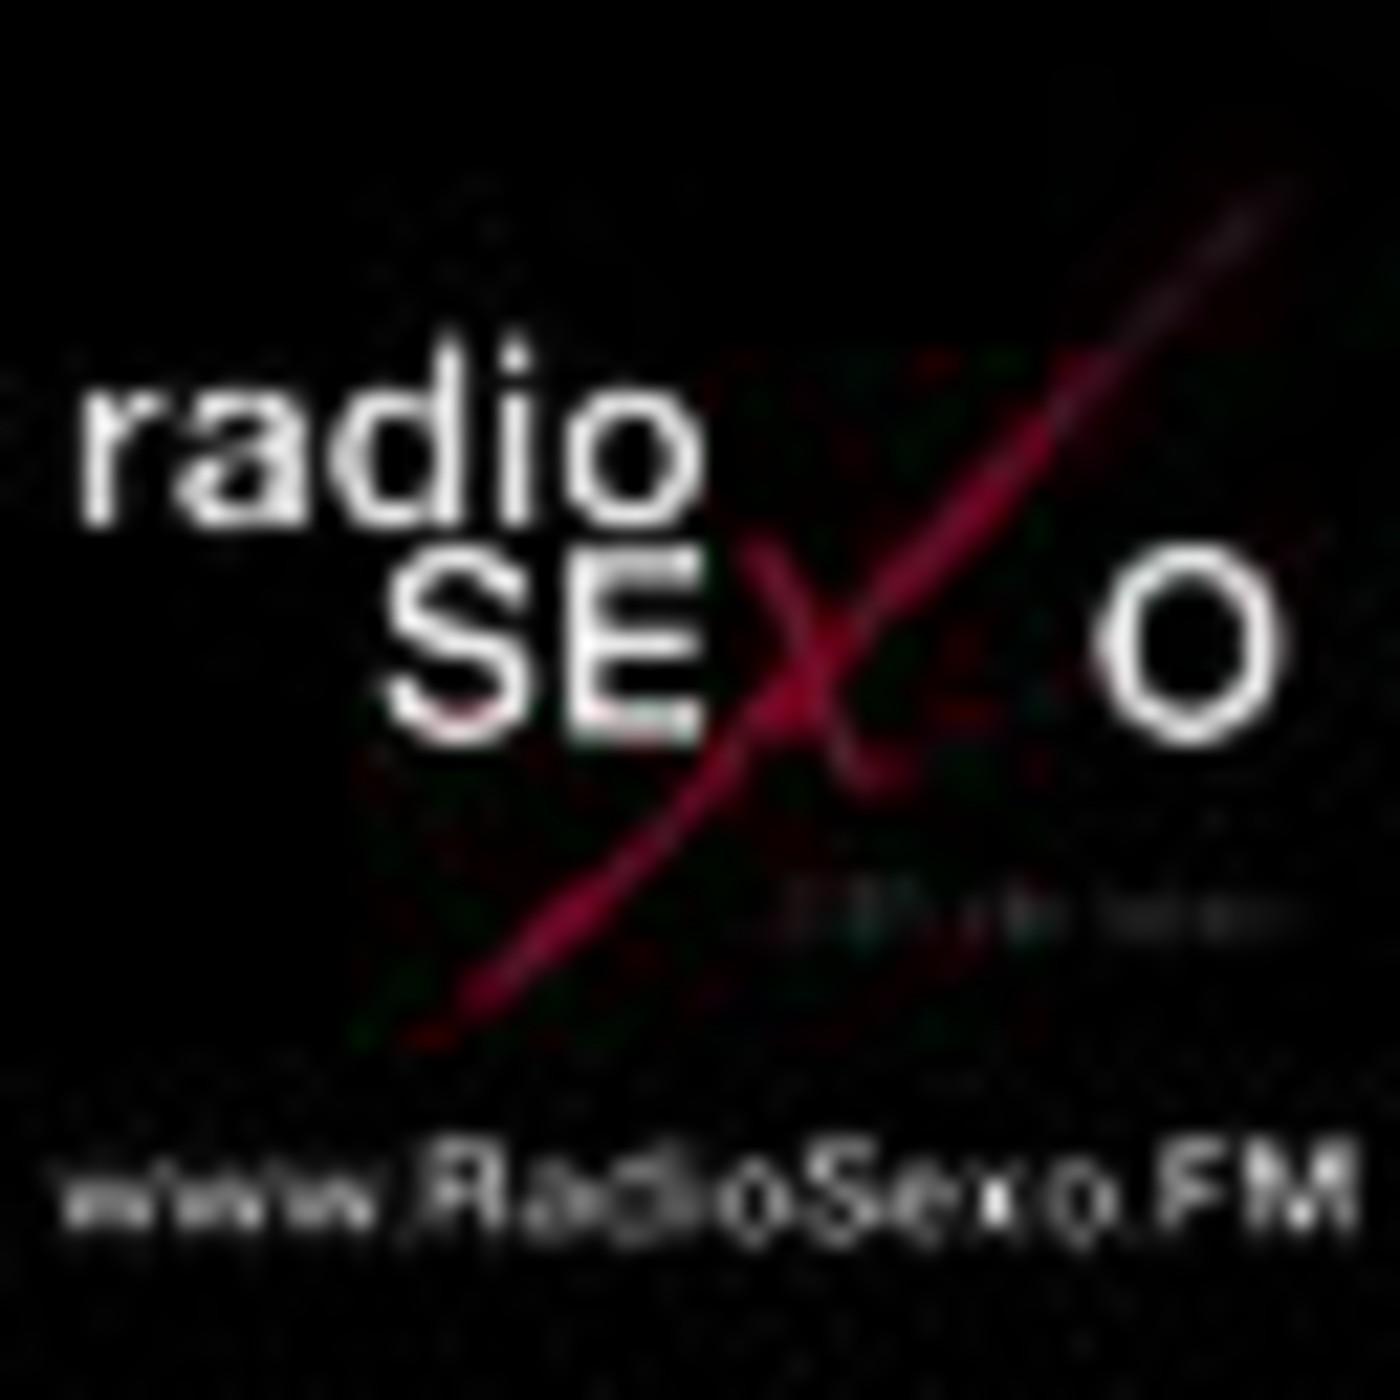 RadioSexo.FM